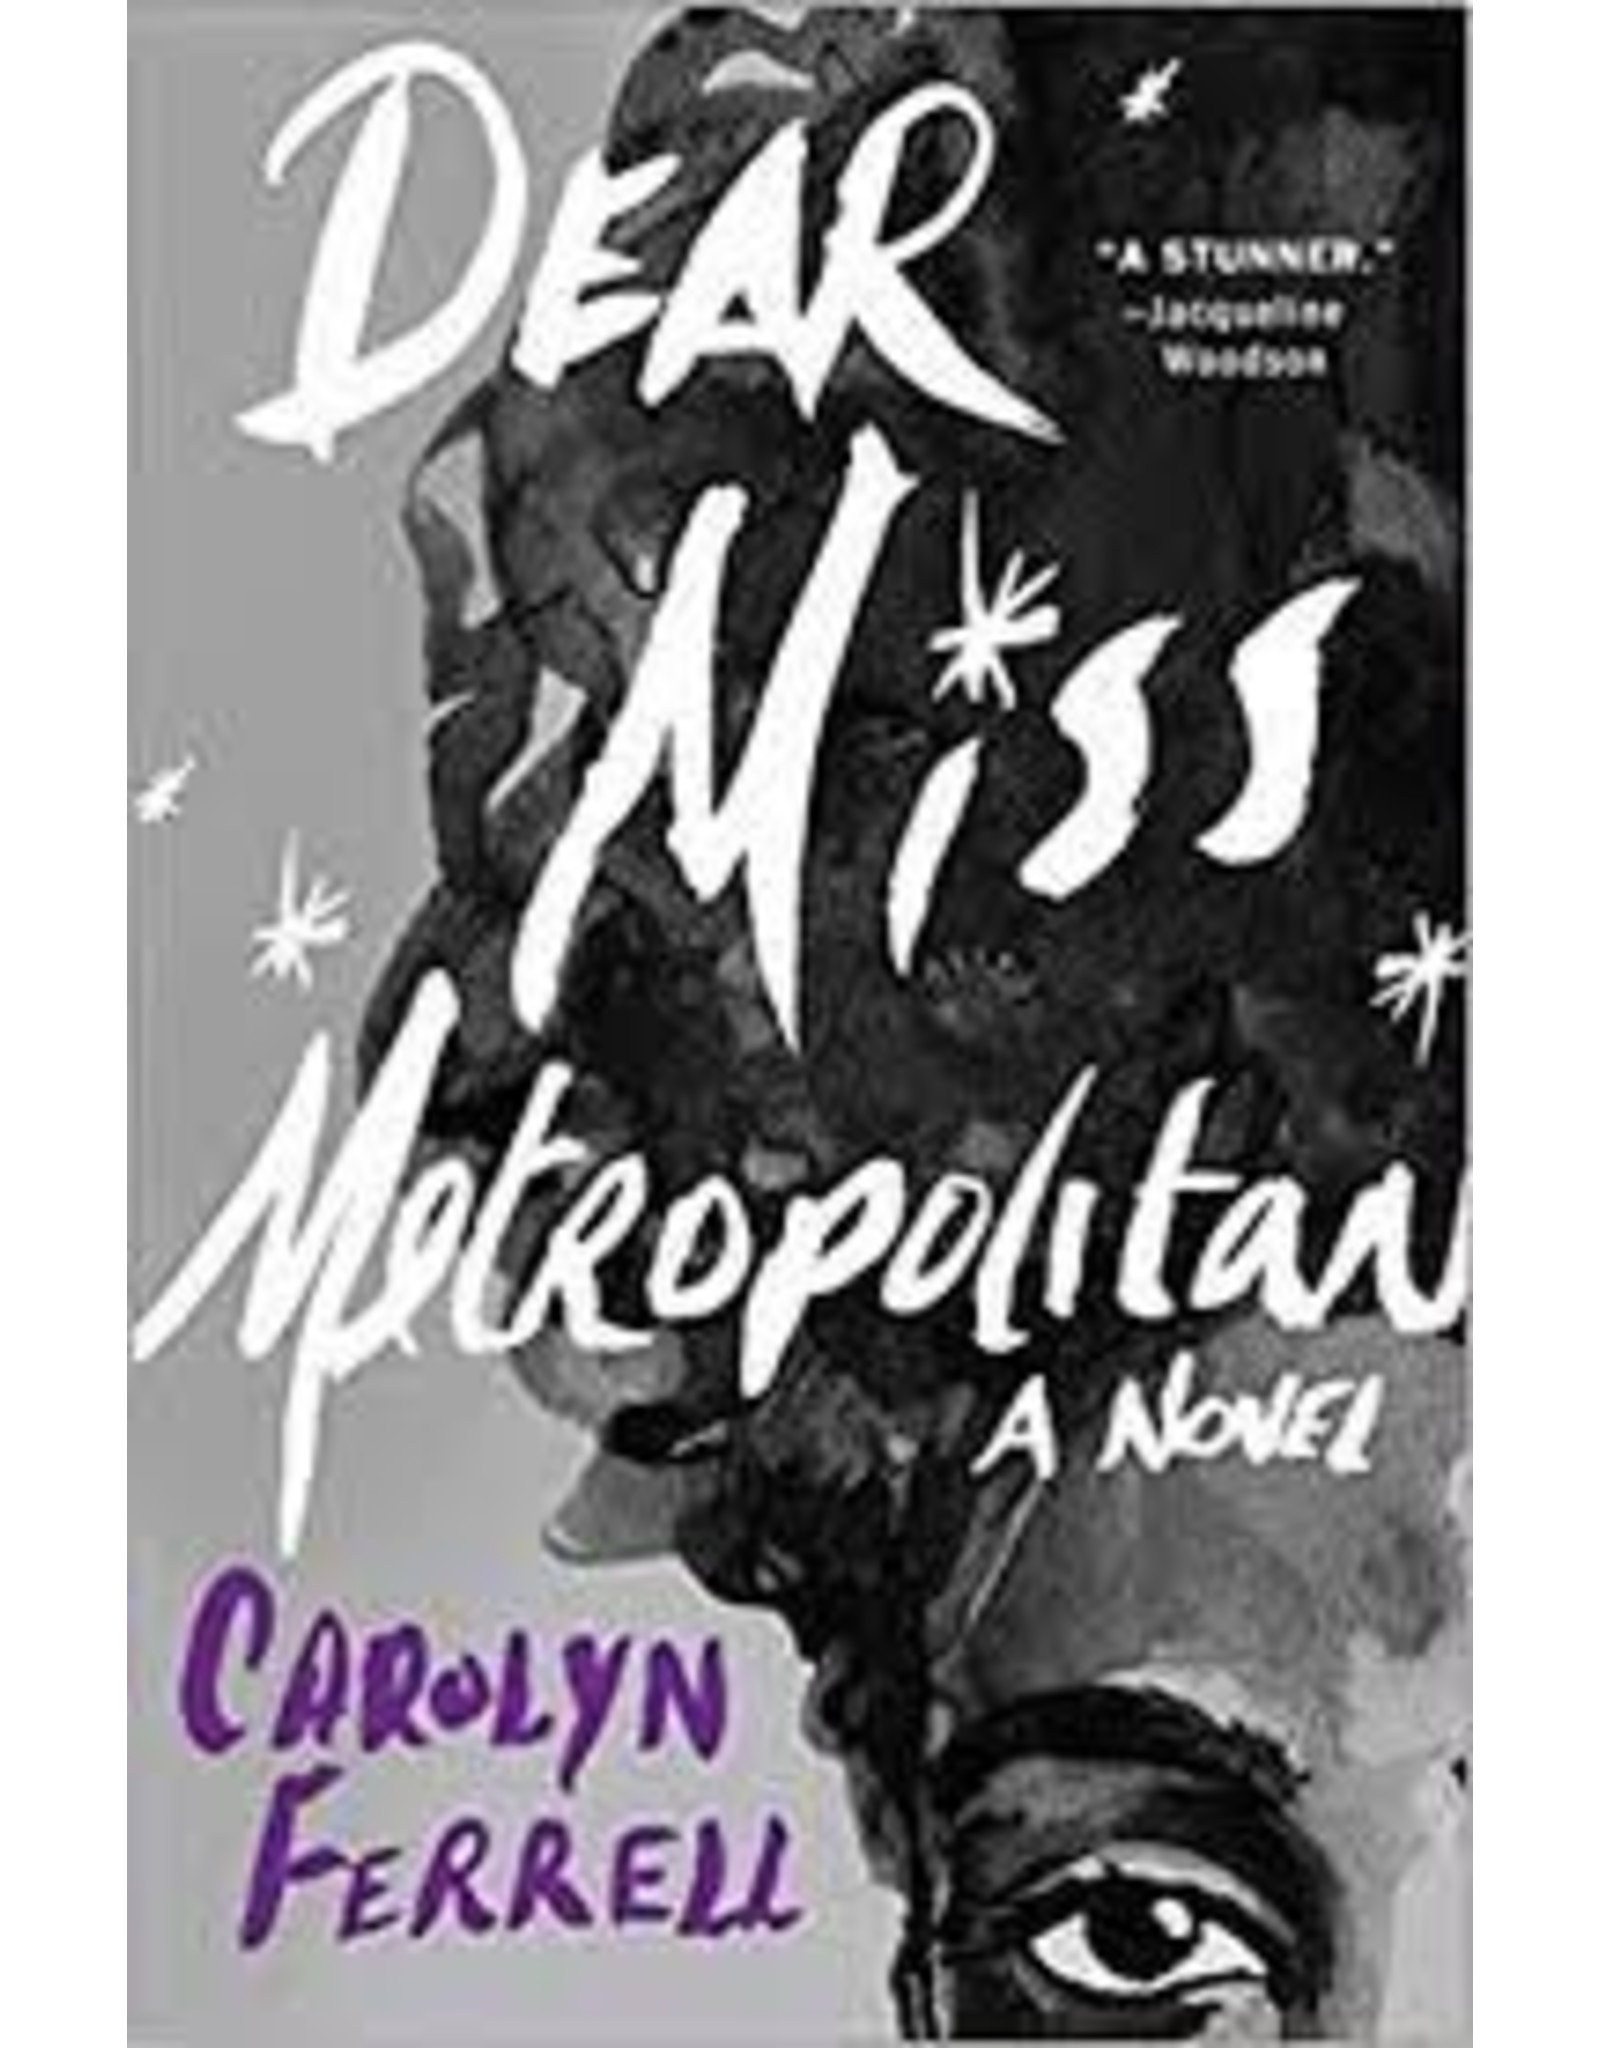 Books Dear Miss Metropolitan : A Novel by Carolyn Ferrell